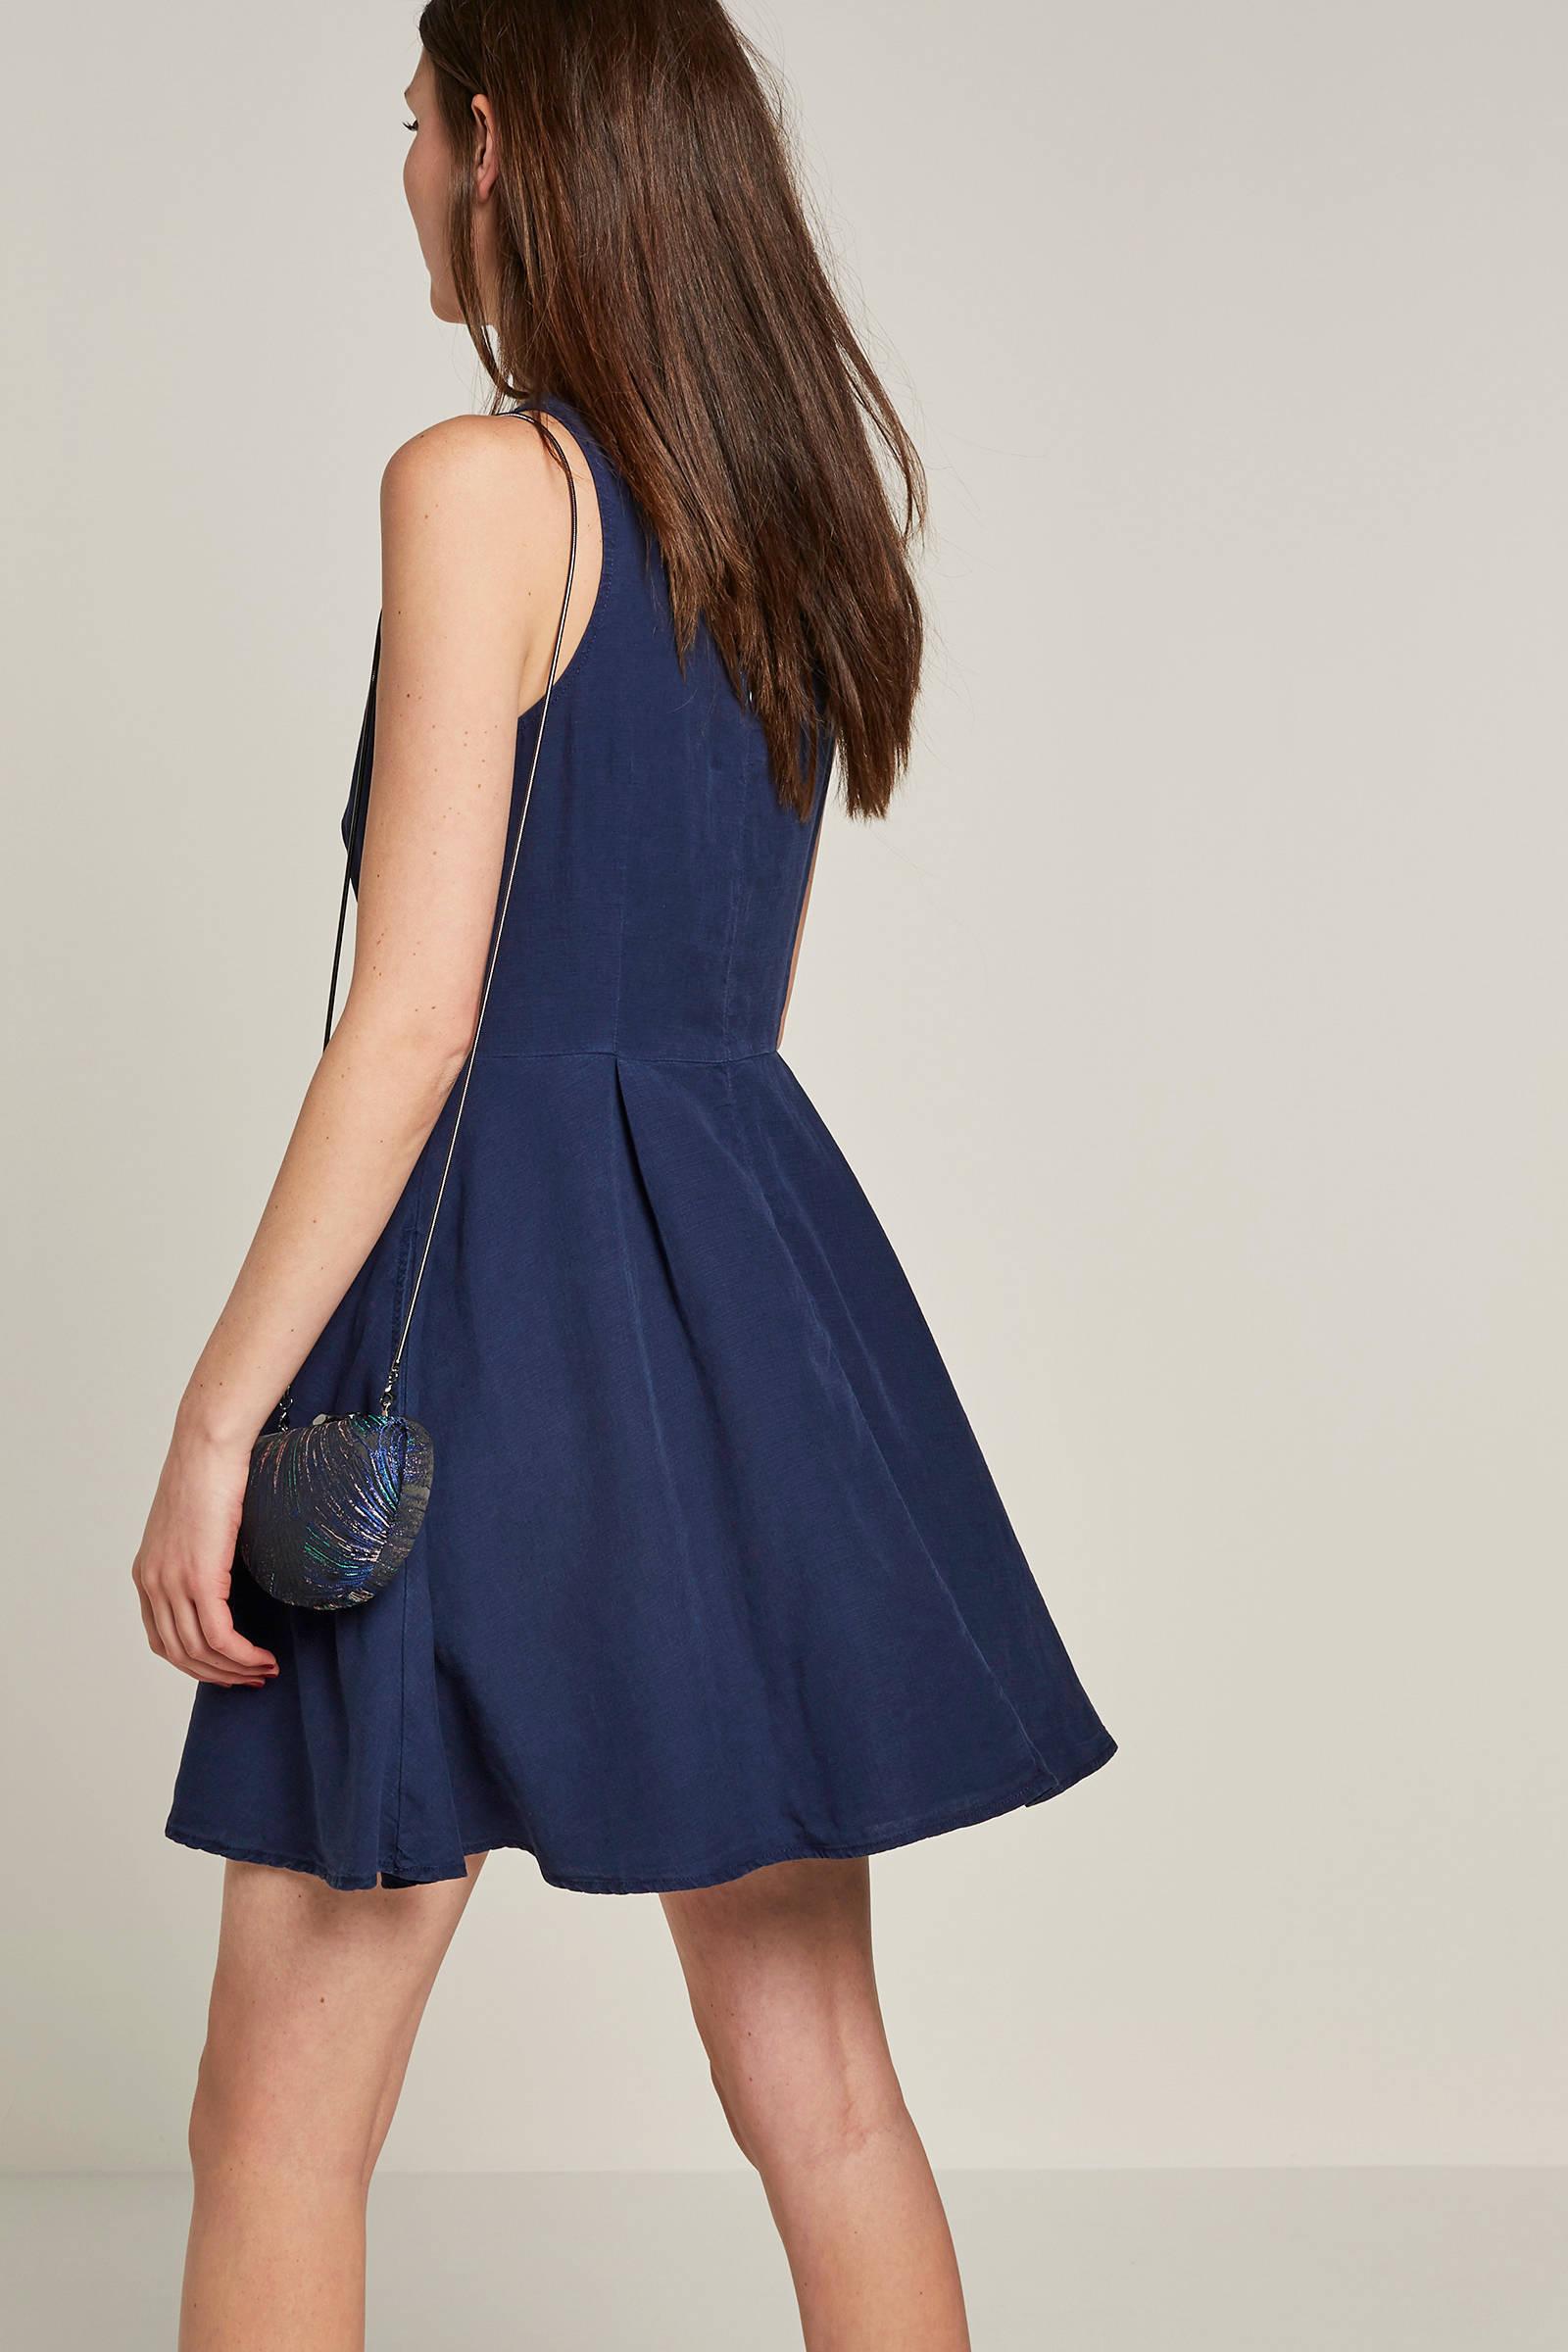 2ad70815f0ca46 ESPRIT edc Women jurk met knopen donkerblauw